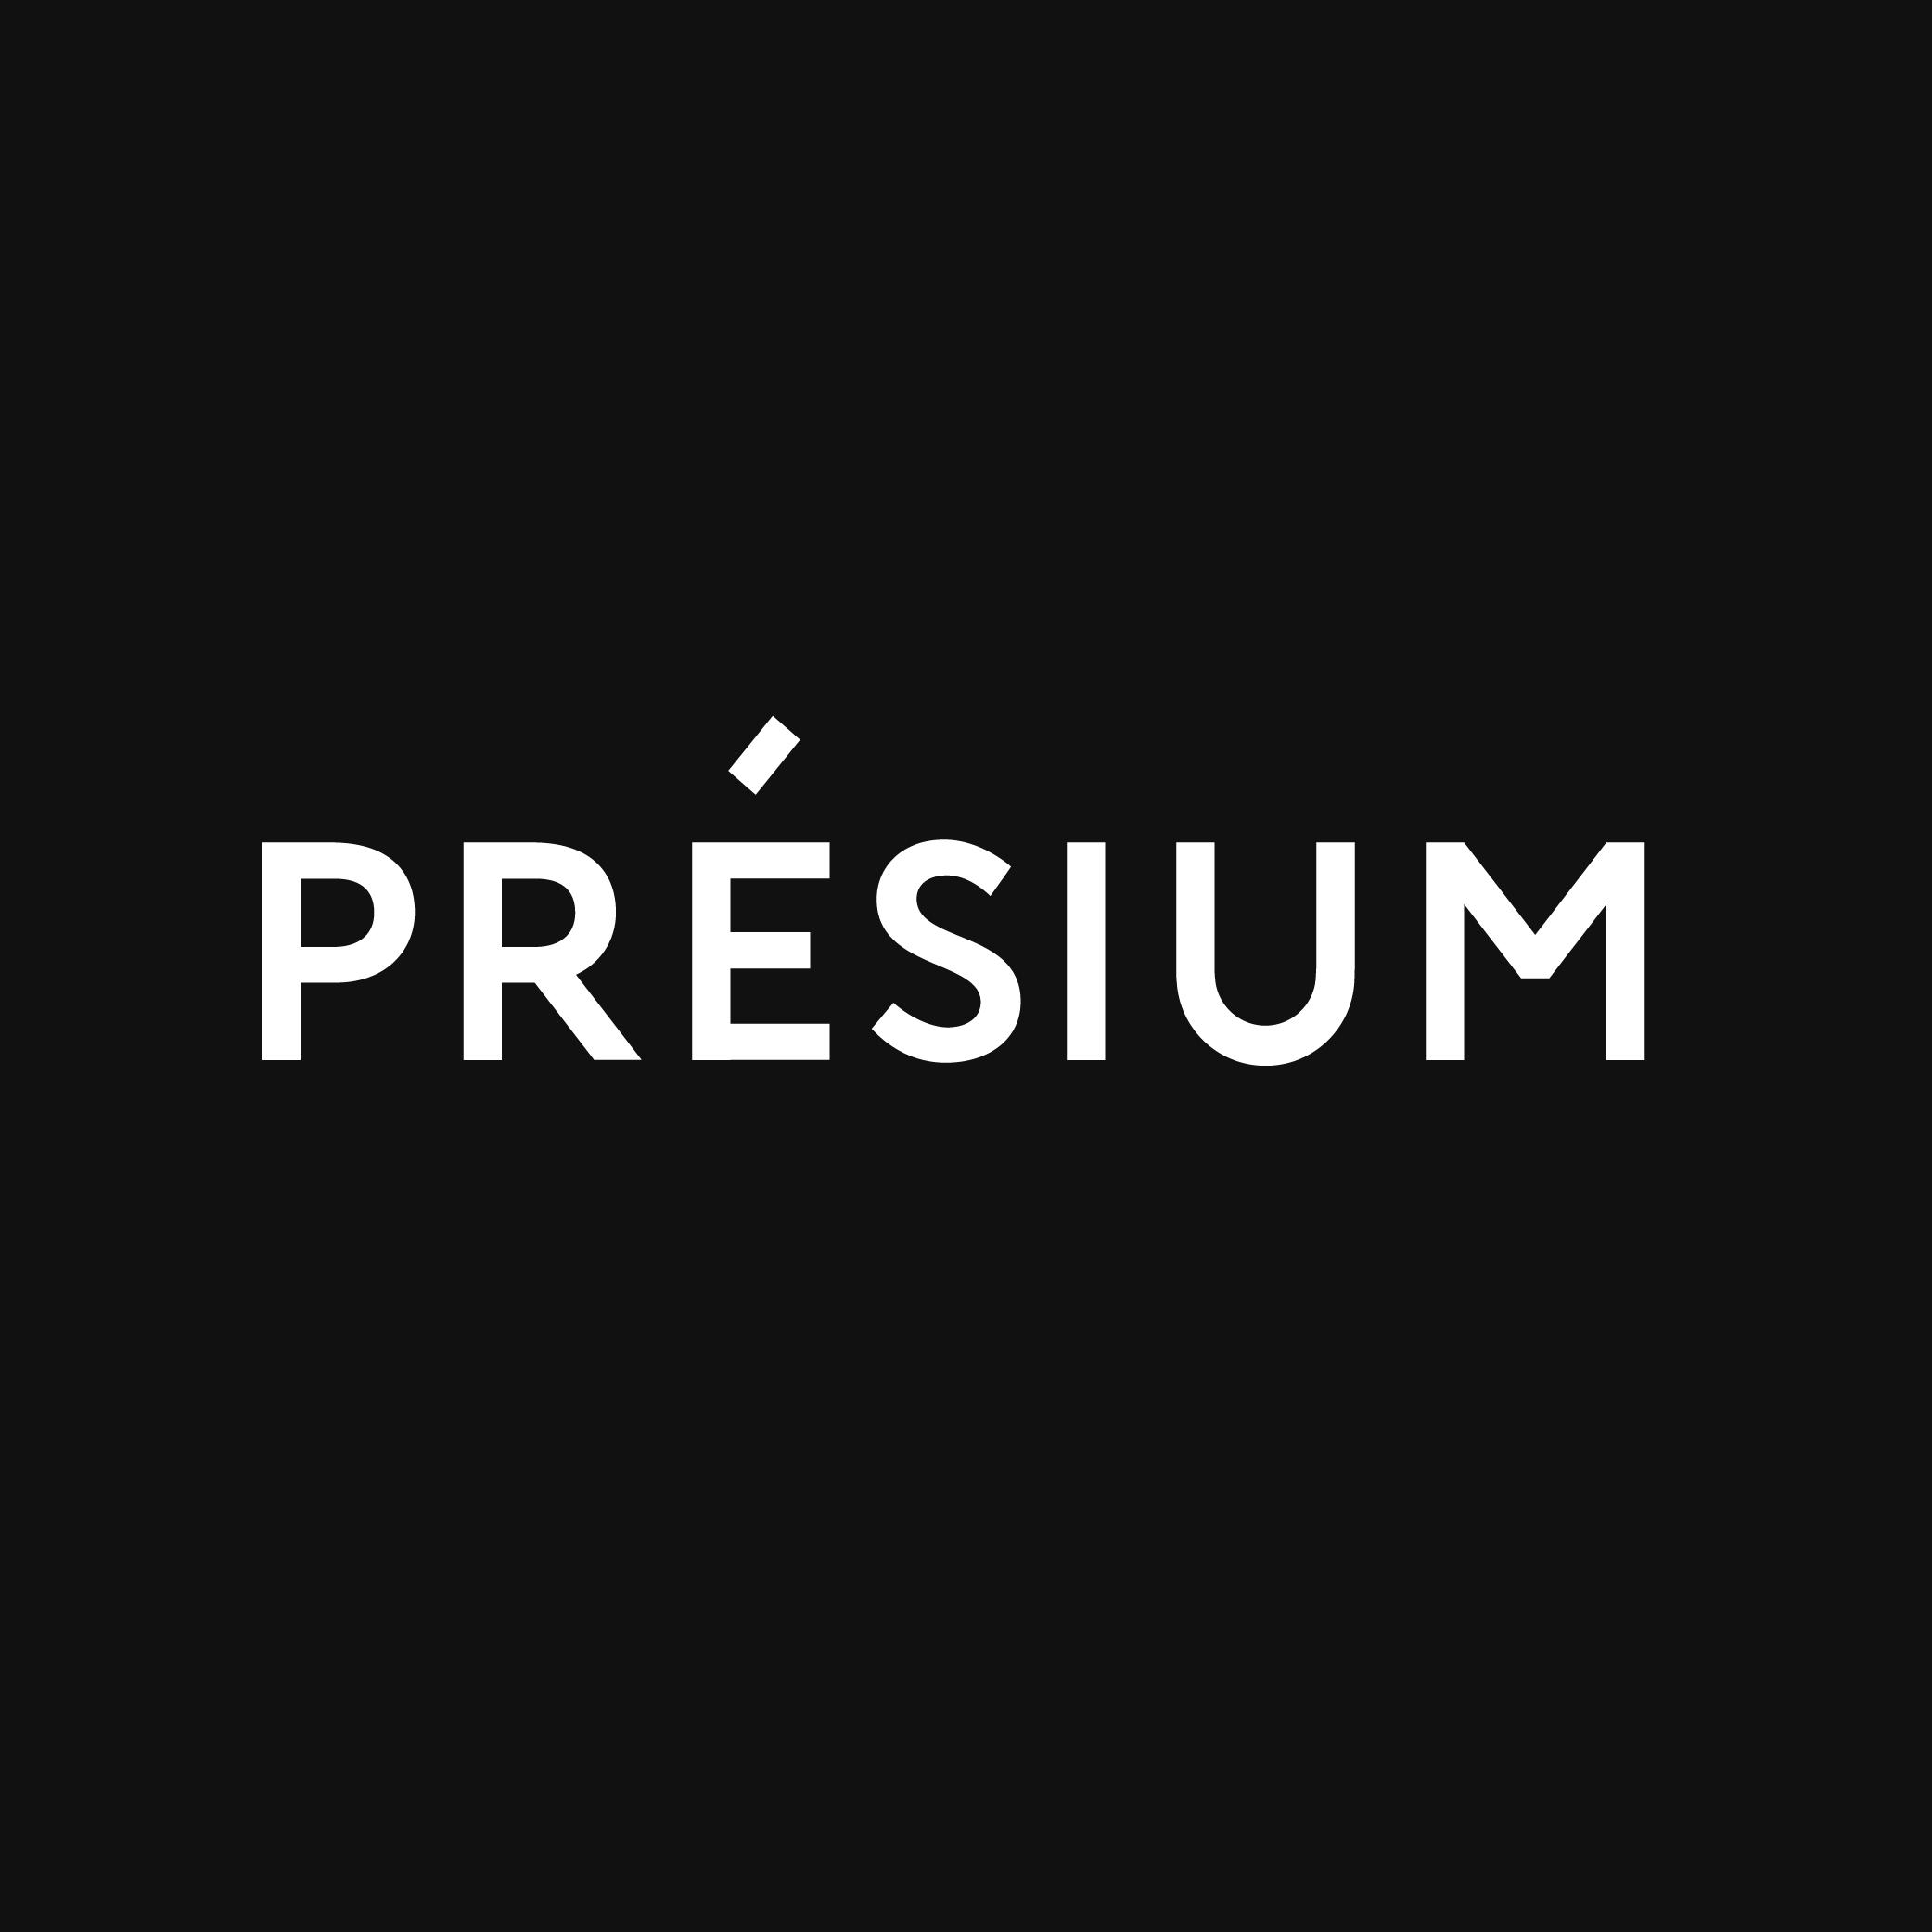 Presium Logo